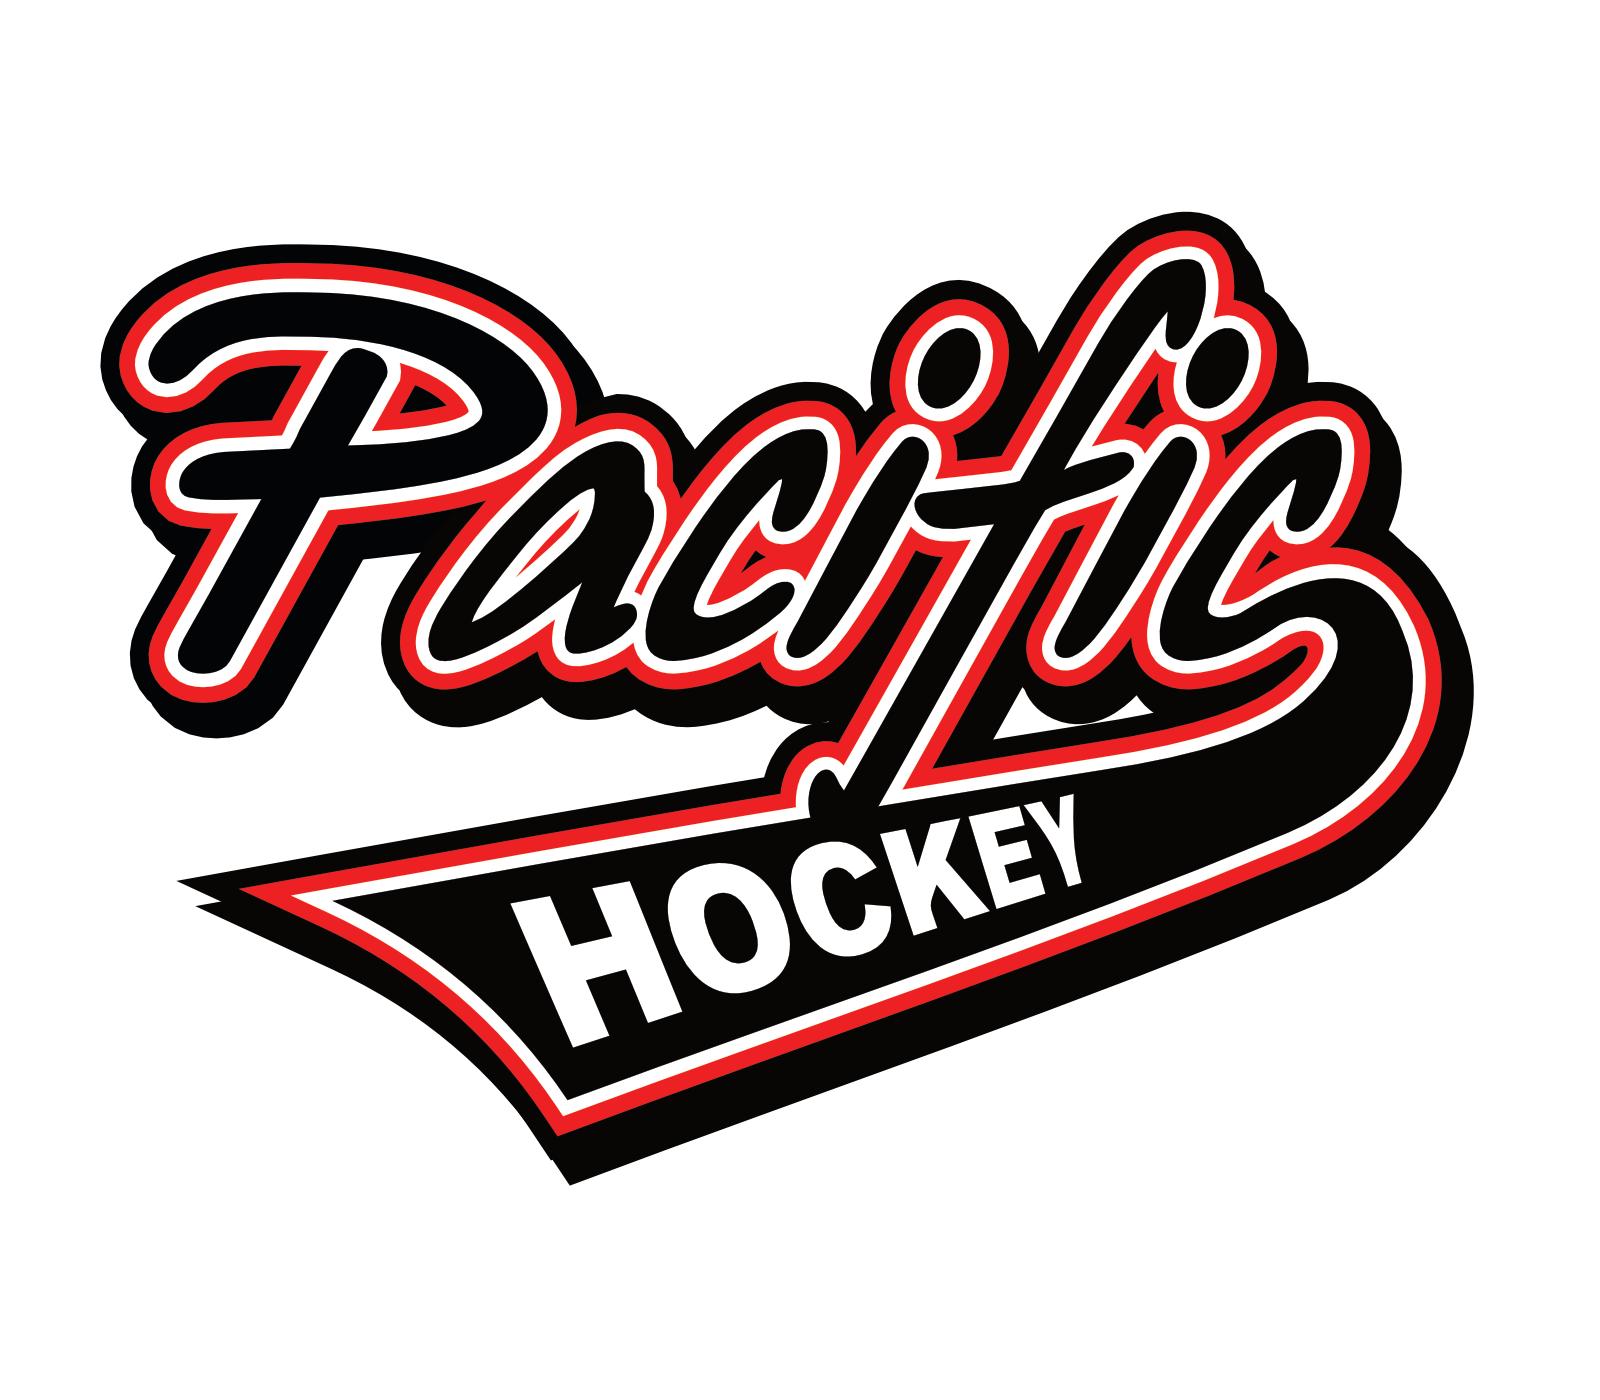 2007 Pacific Hockey